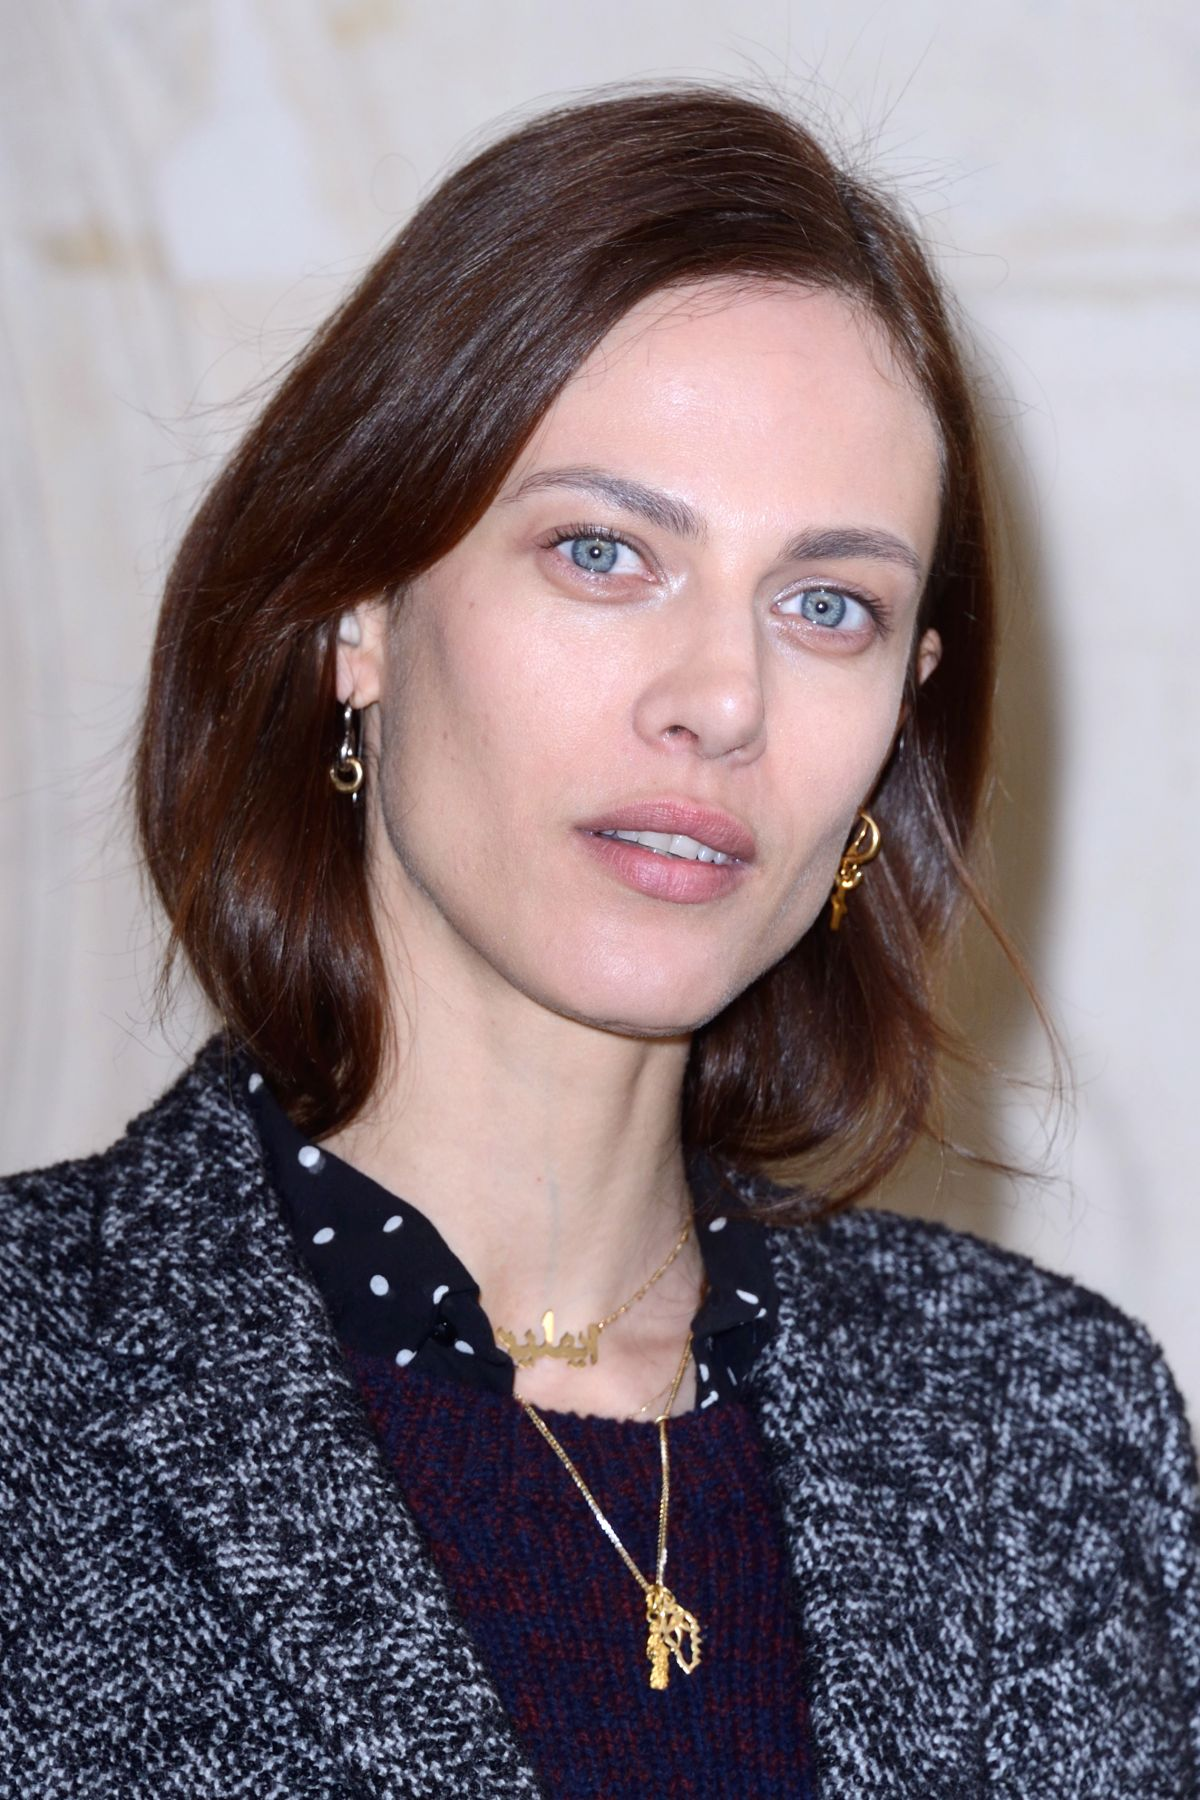 Aymeline Valade